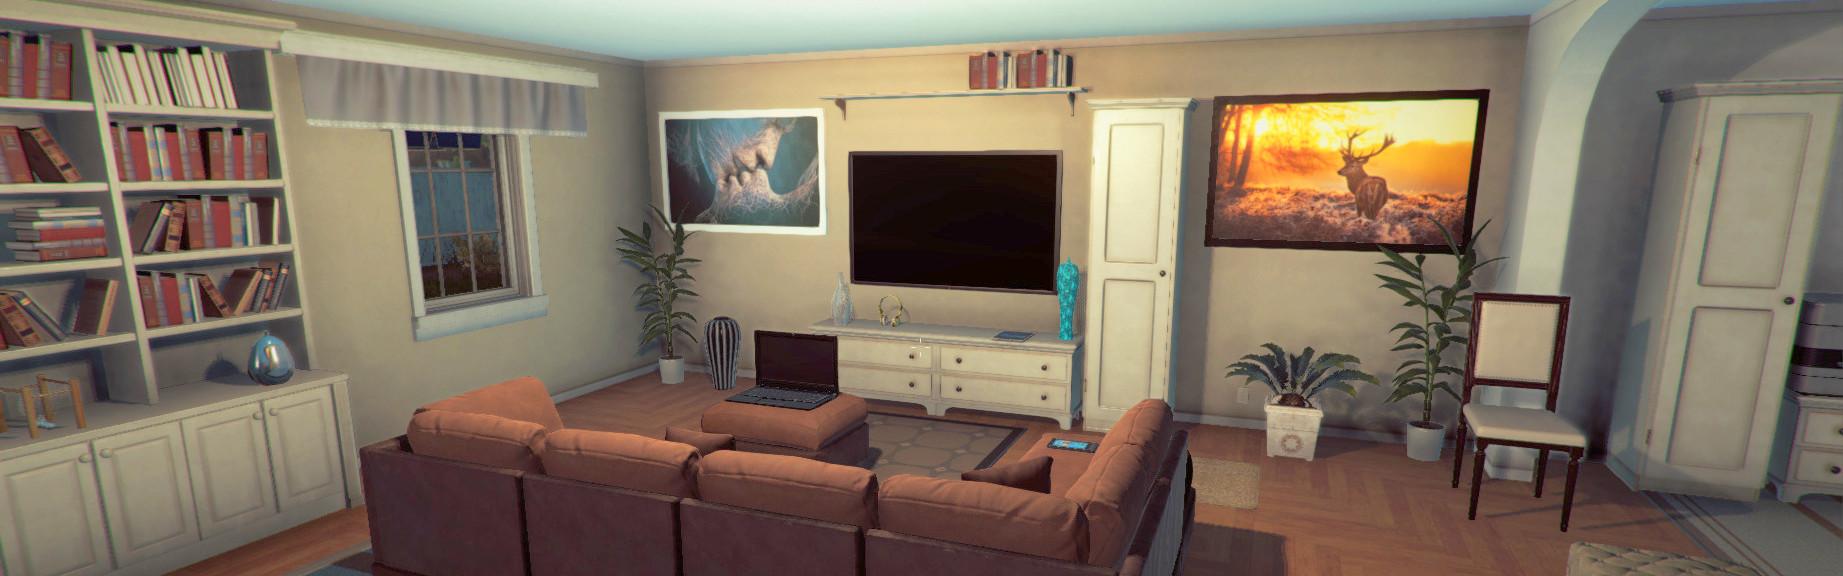 Thief Simulator Steam Key GLOBAL